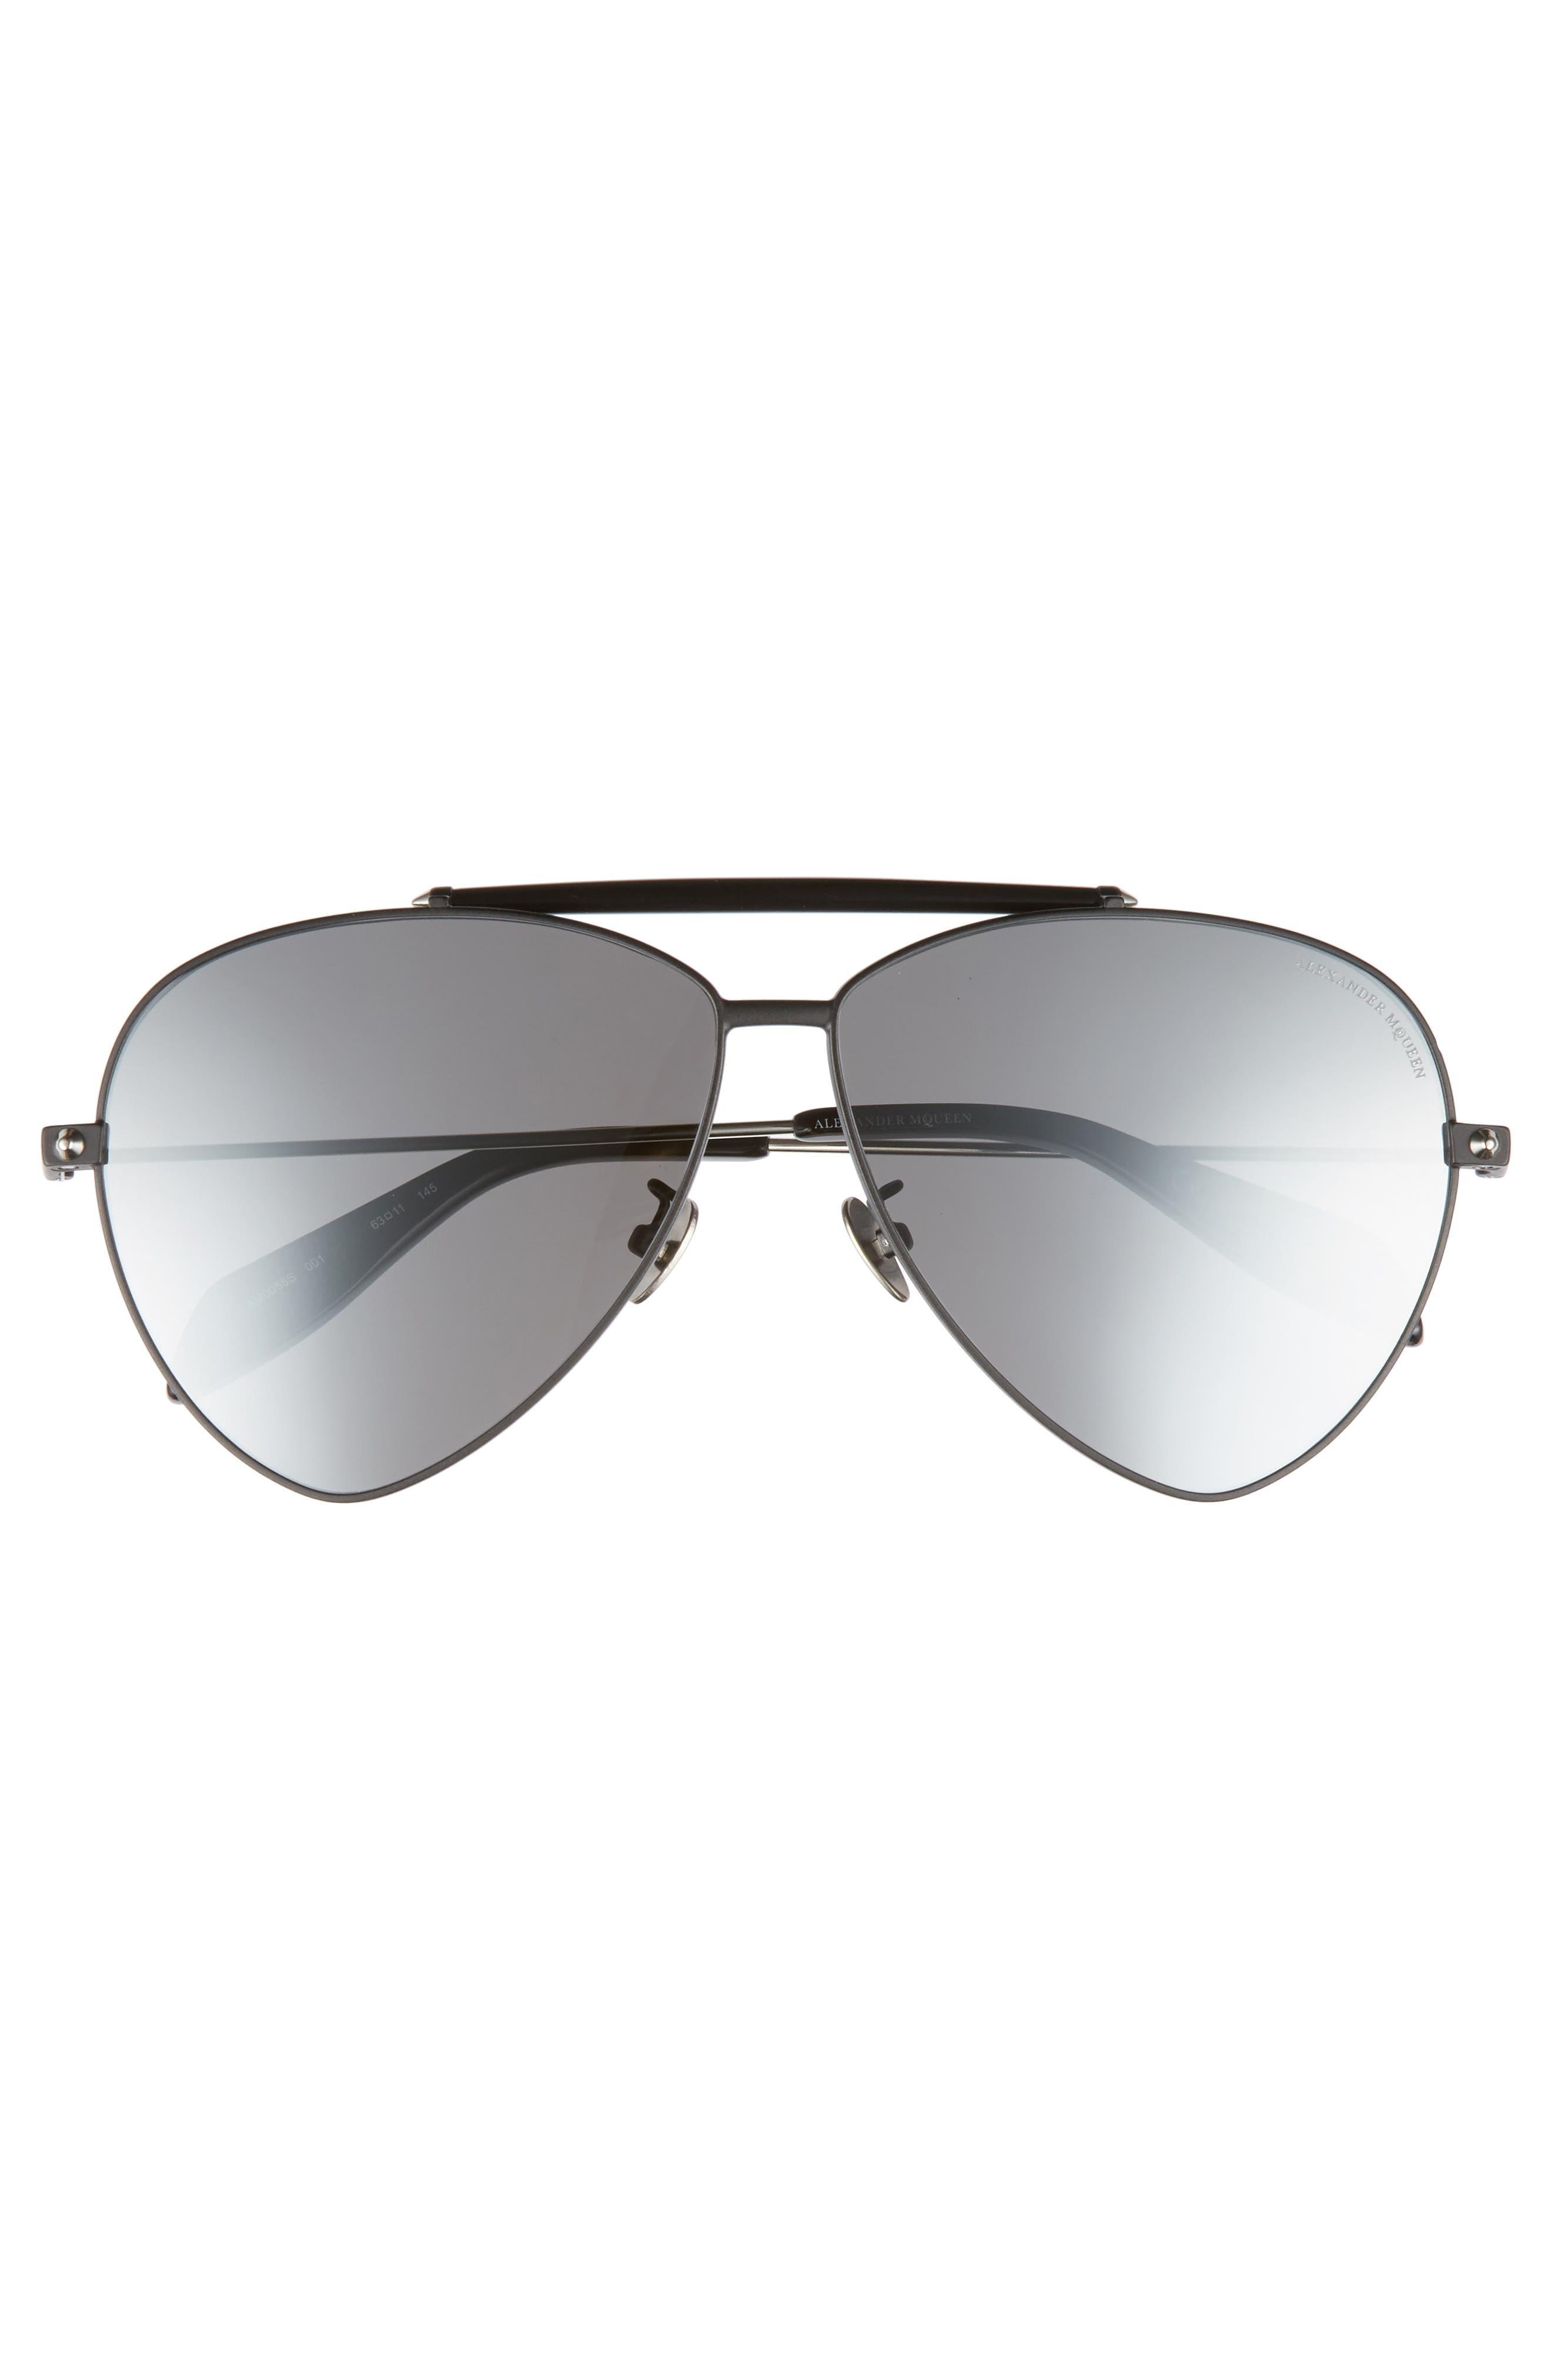 63mm Oversize Aviator Sunglasses,                             Alternate thumbnail 5, color,